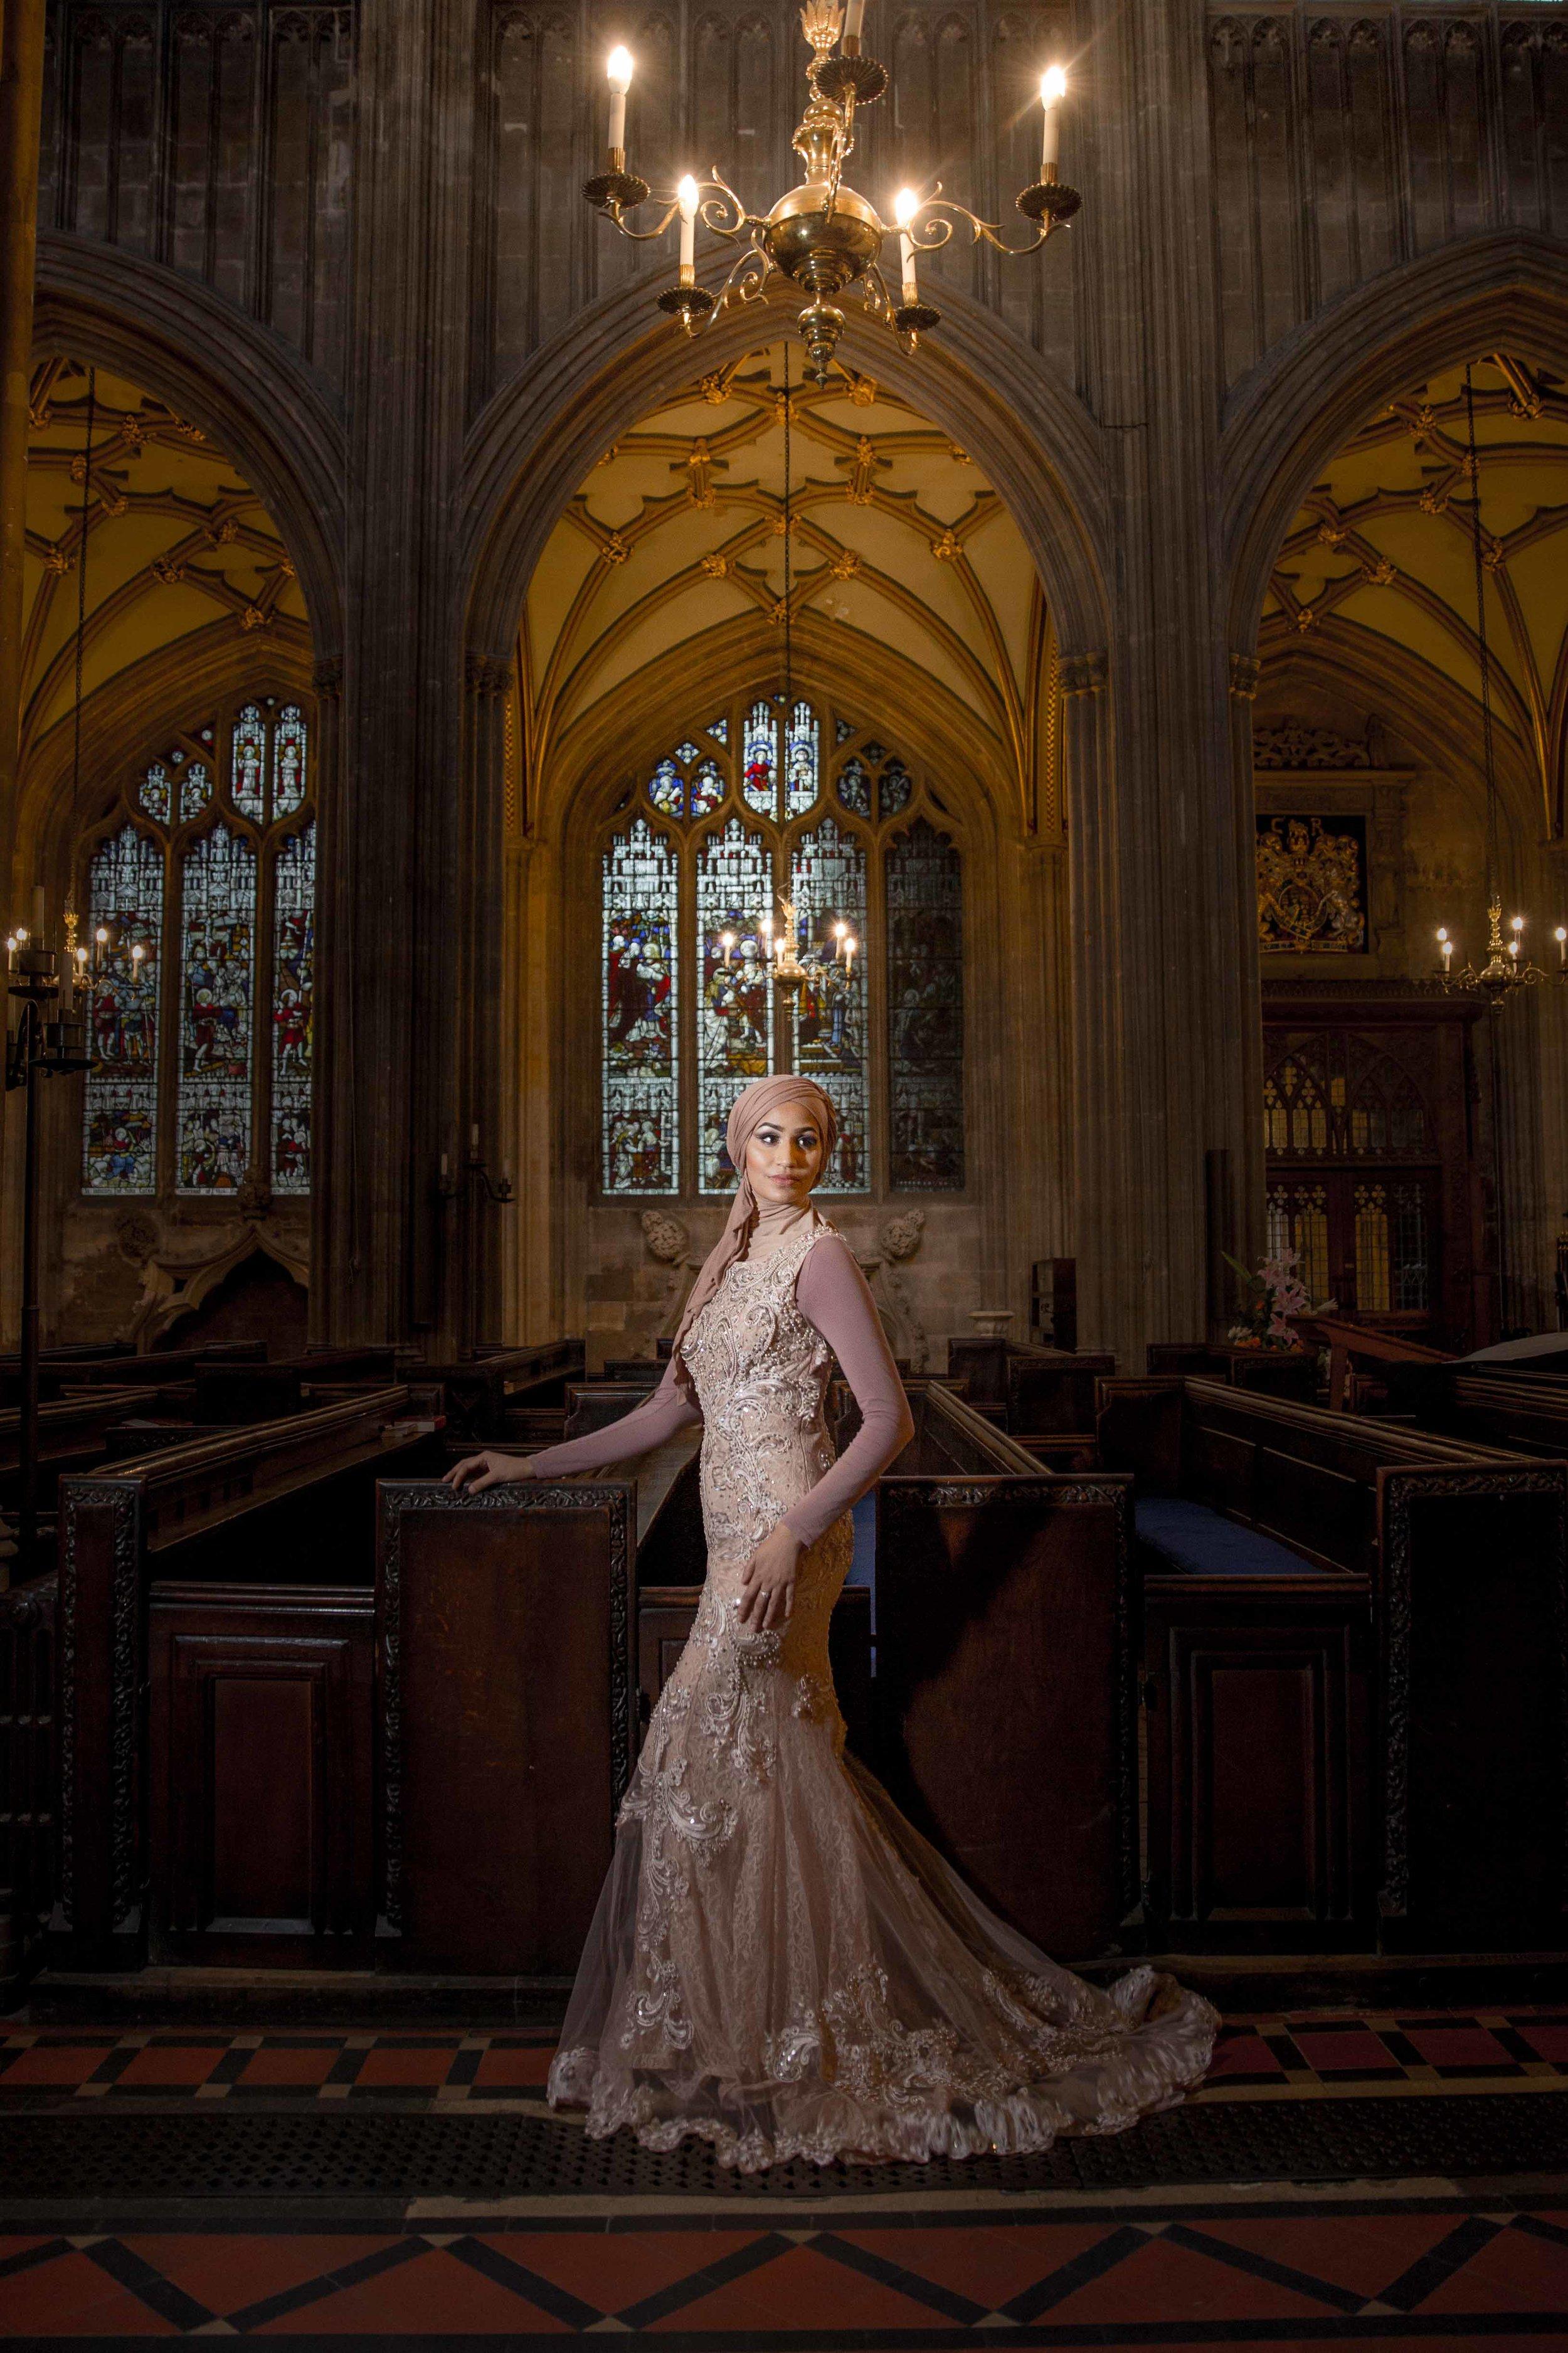 modest-street-aisha-rahman-fashion-photography-london-bristol-natalia-smith-photography-st-St-Mary-Redcliffe-Church-2.jpg